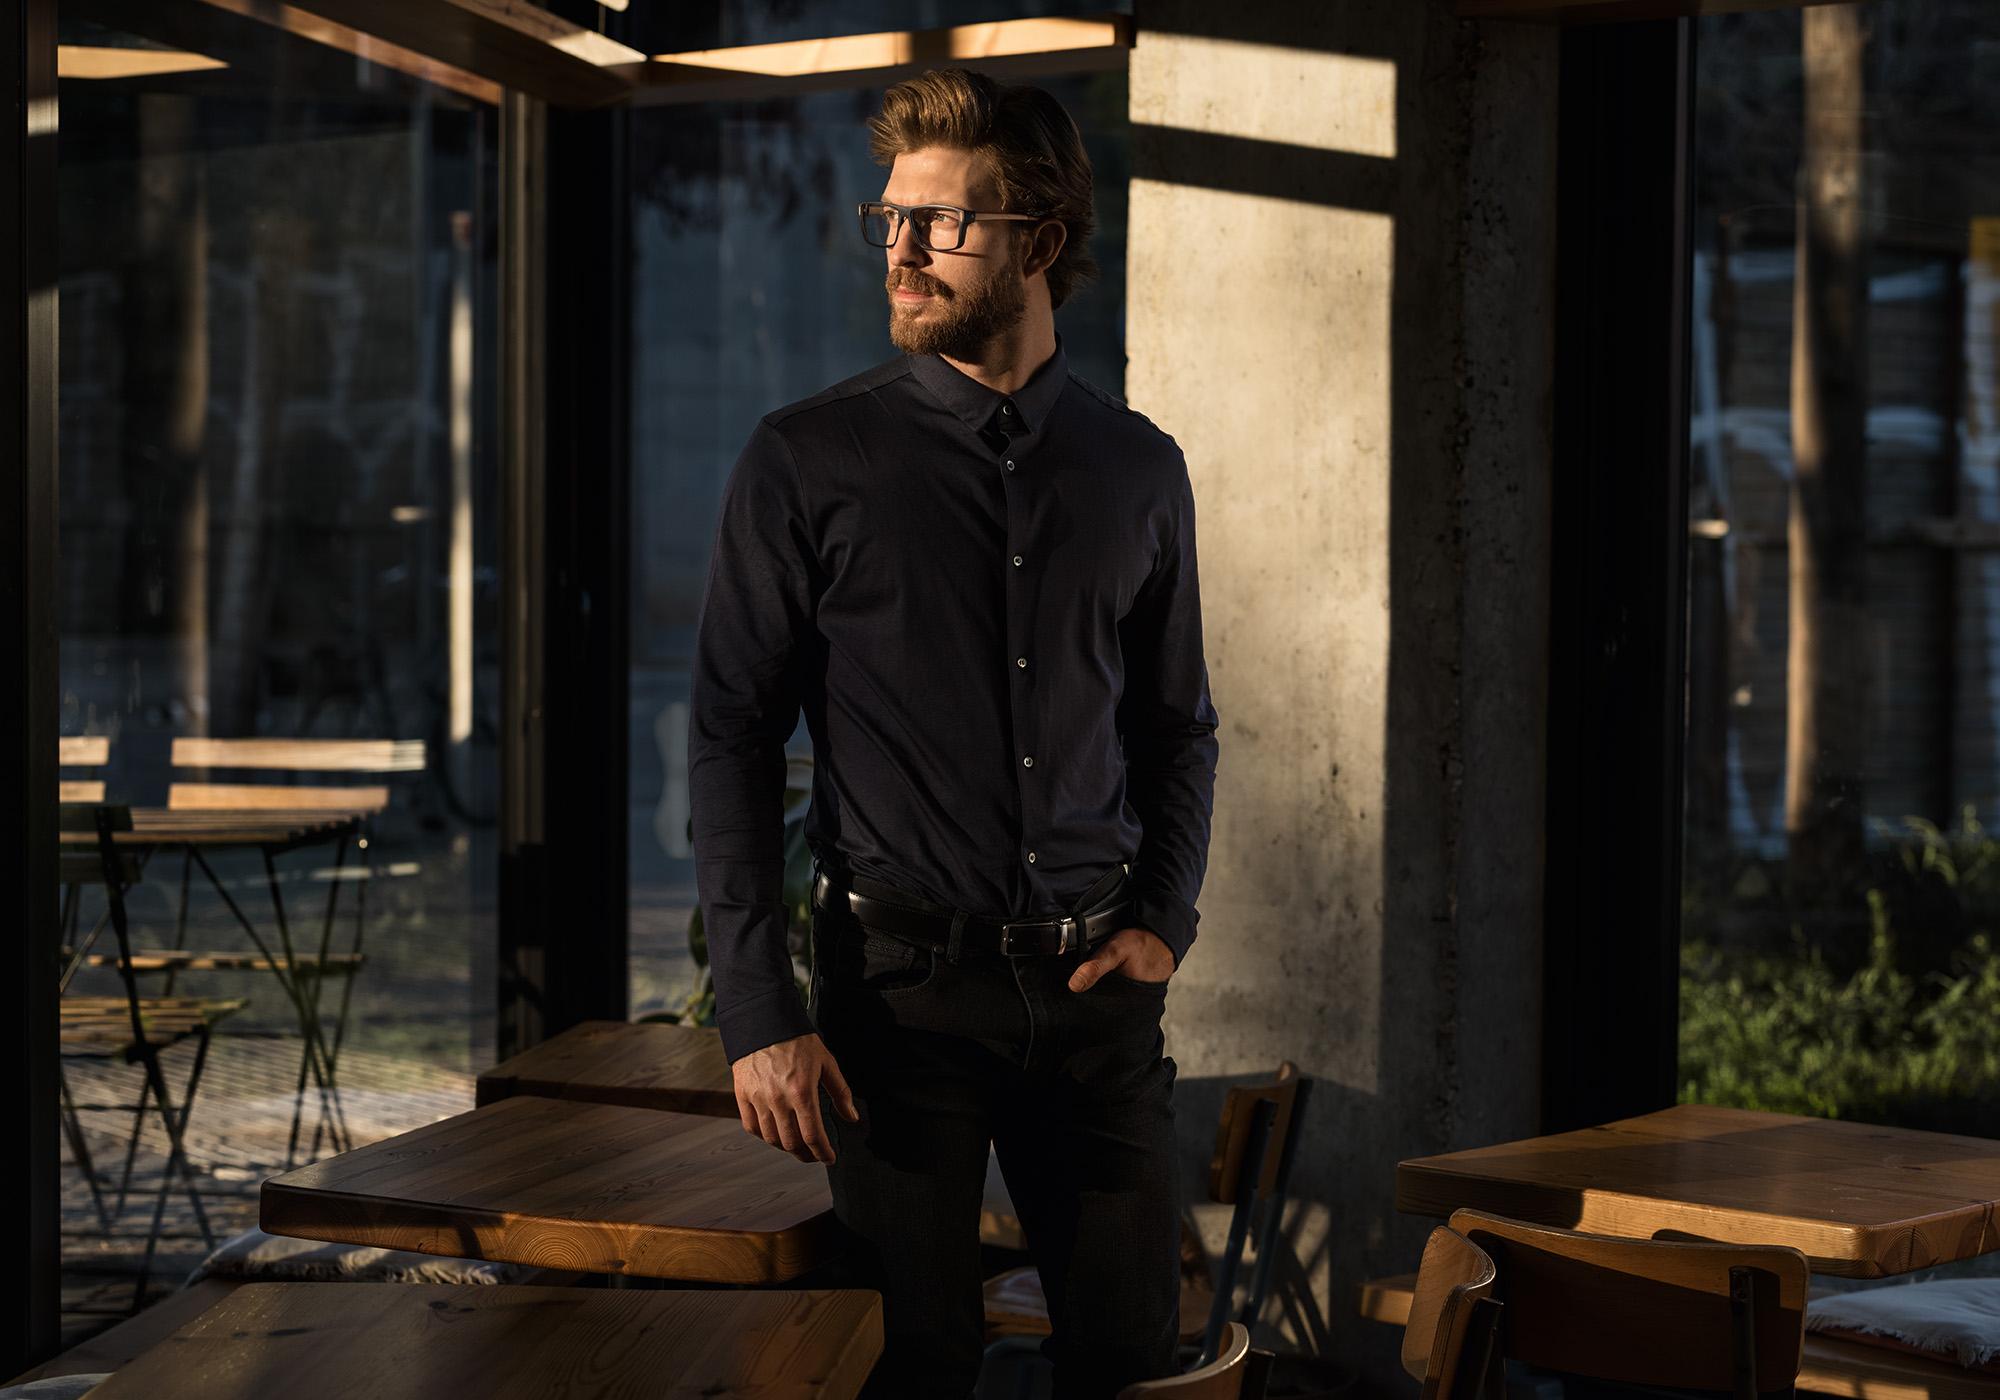 Client Rodenstock | Photographer Johannes Mink